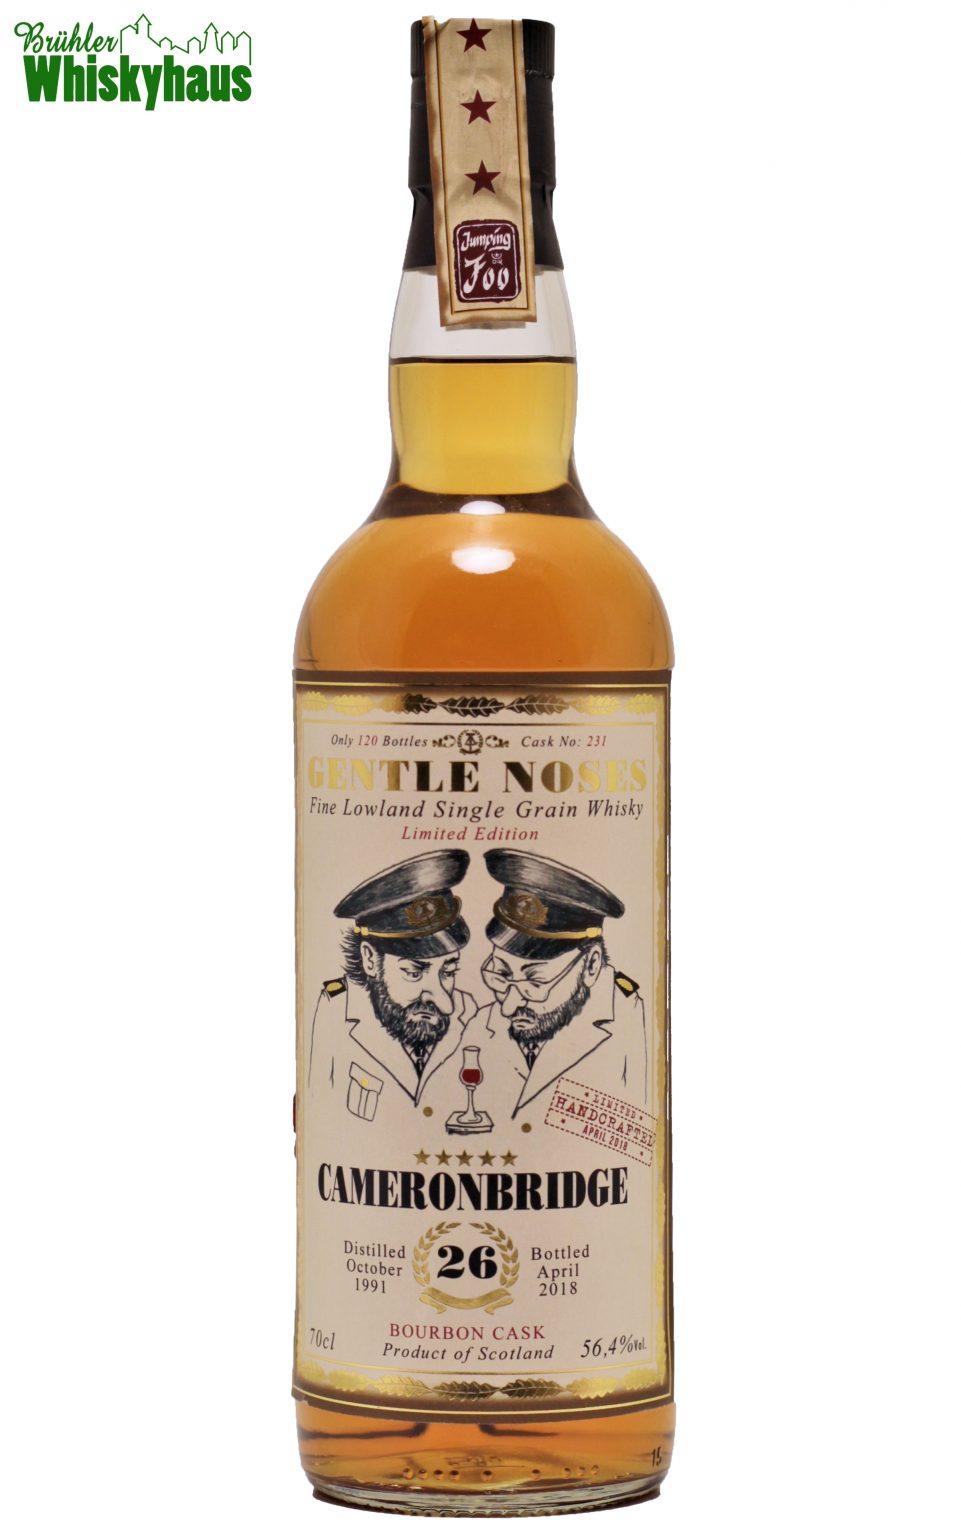 Cameronbridge 26 Jahre - Bourbon Cask N°231 - Gentle Noses by Jack Wieber - Single Malt Scotch Whisky